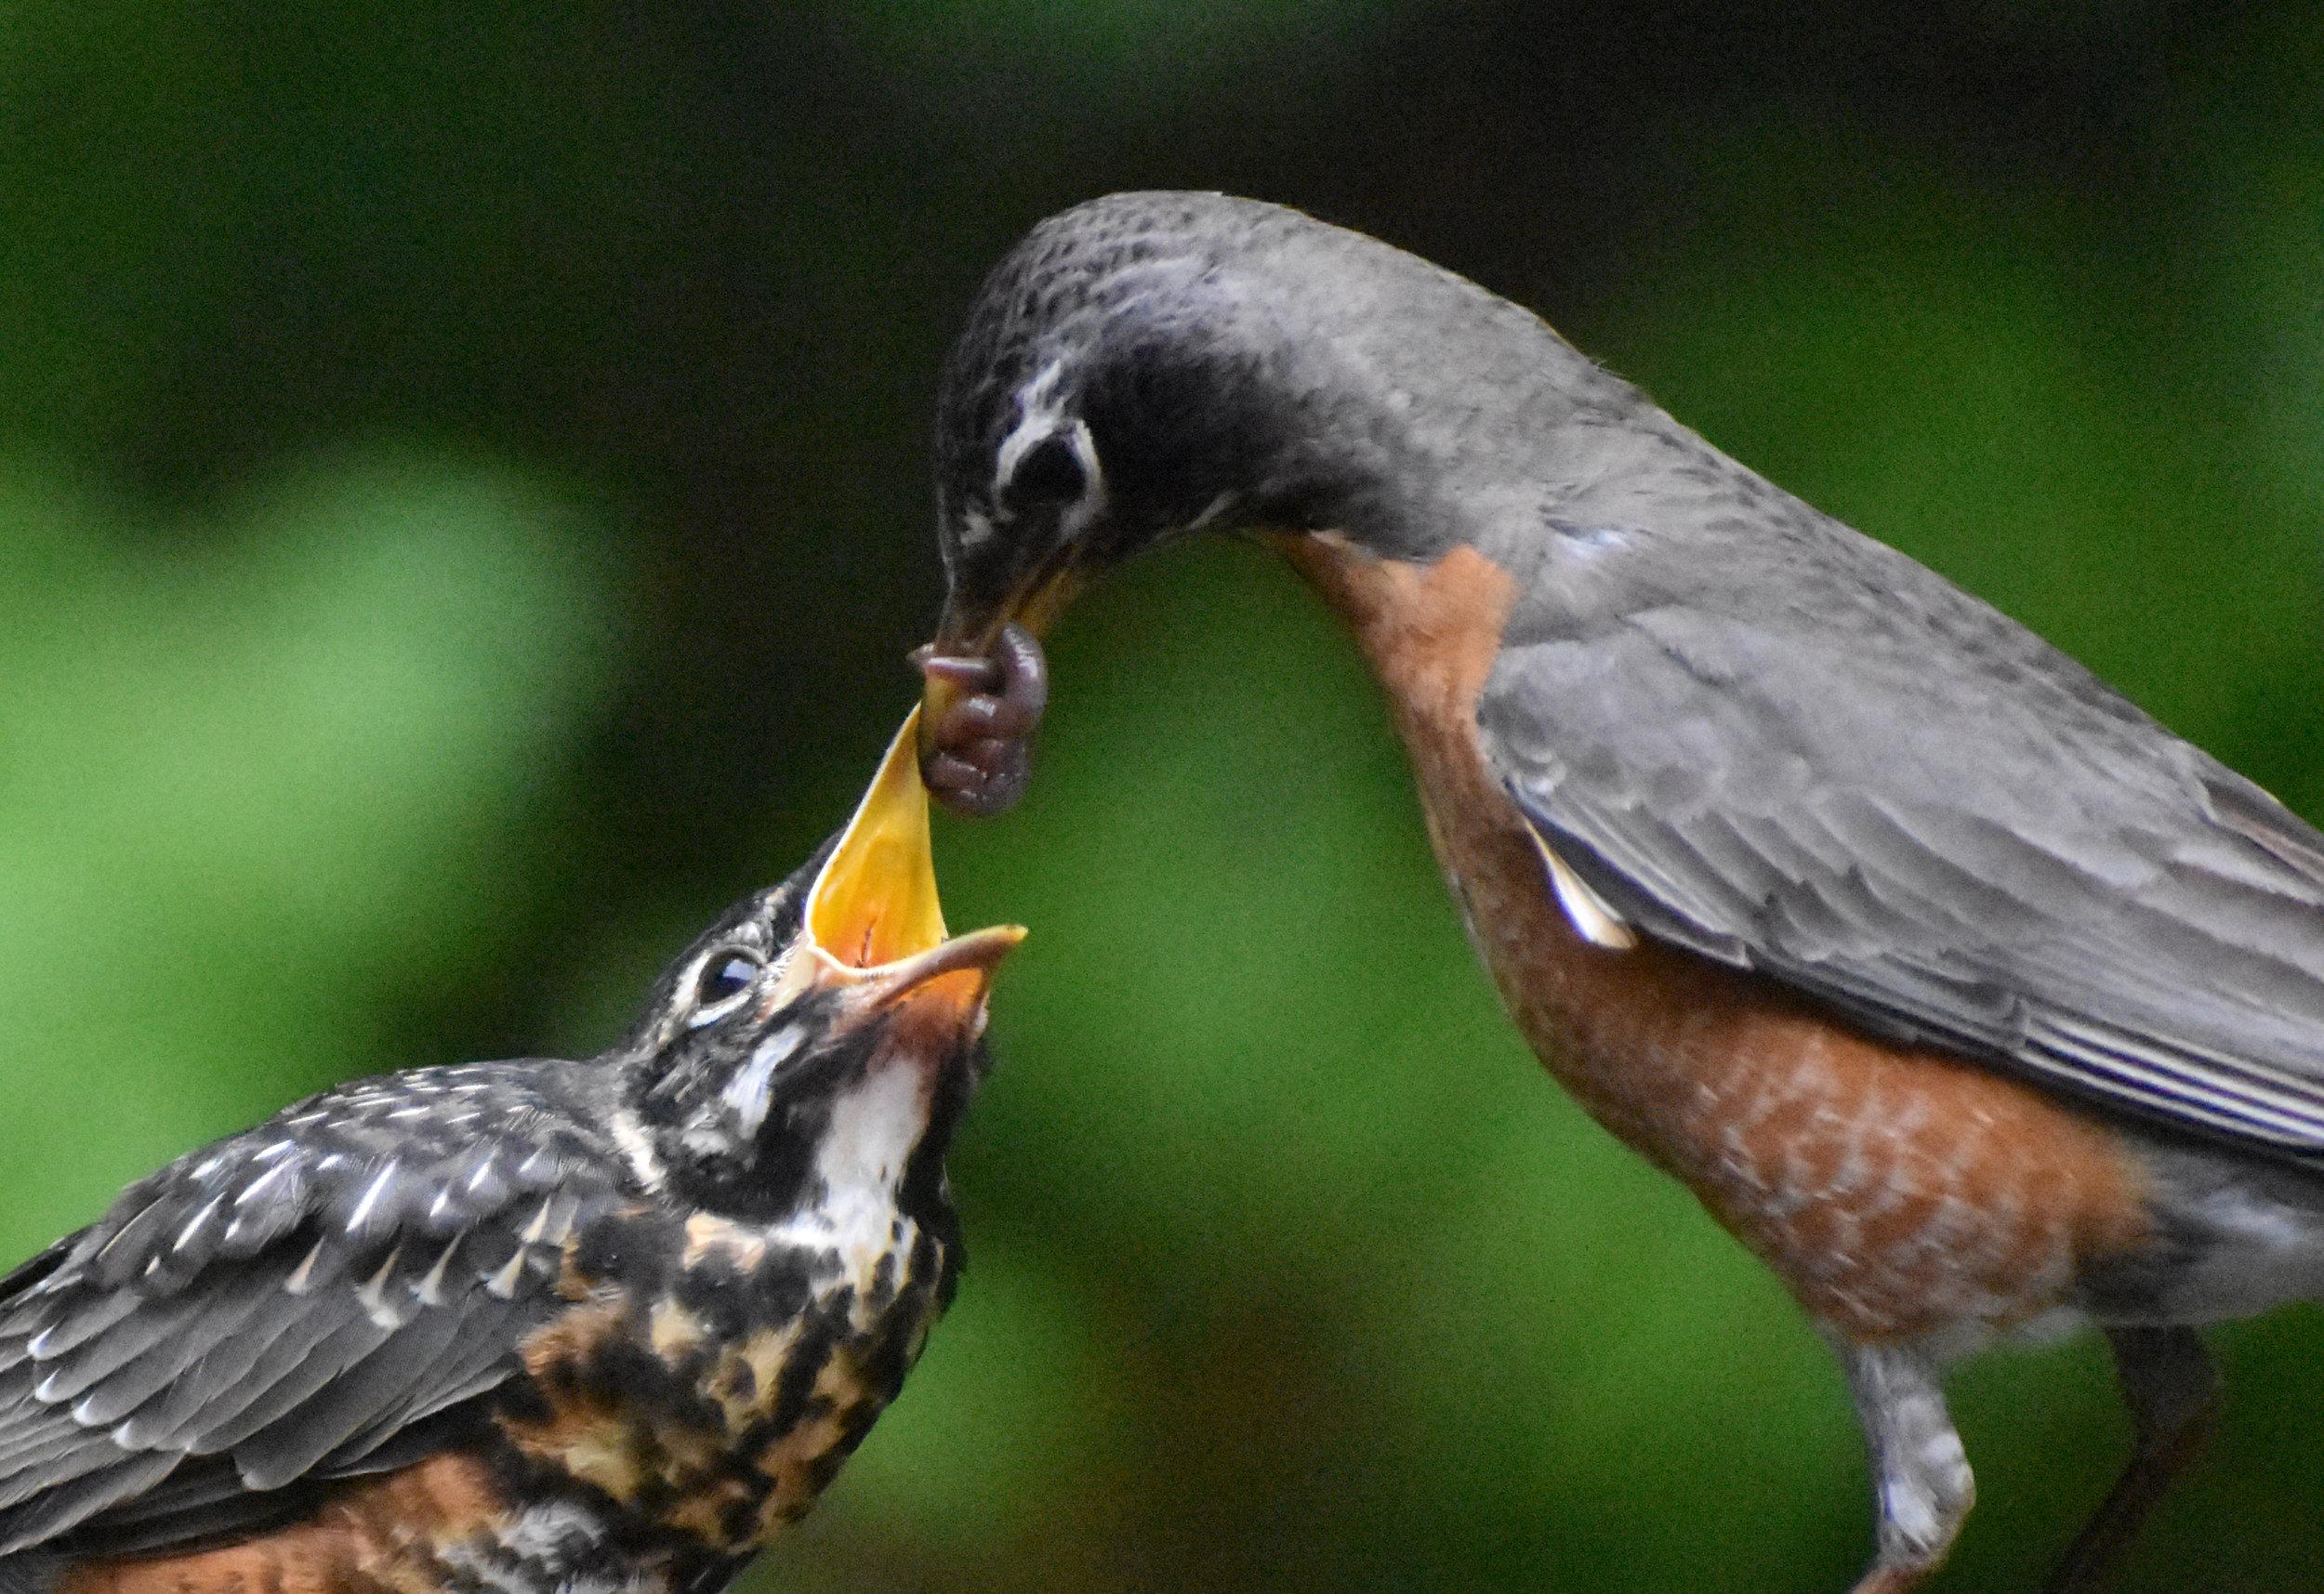 American Robin feeding young earthworms